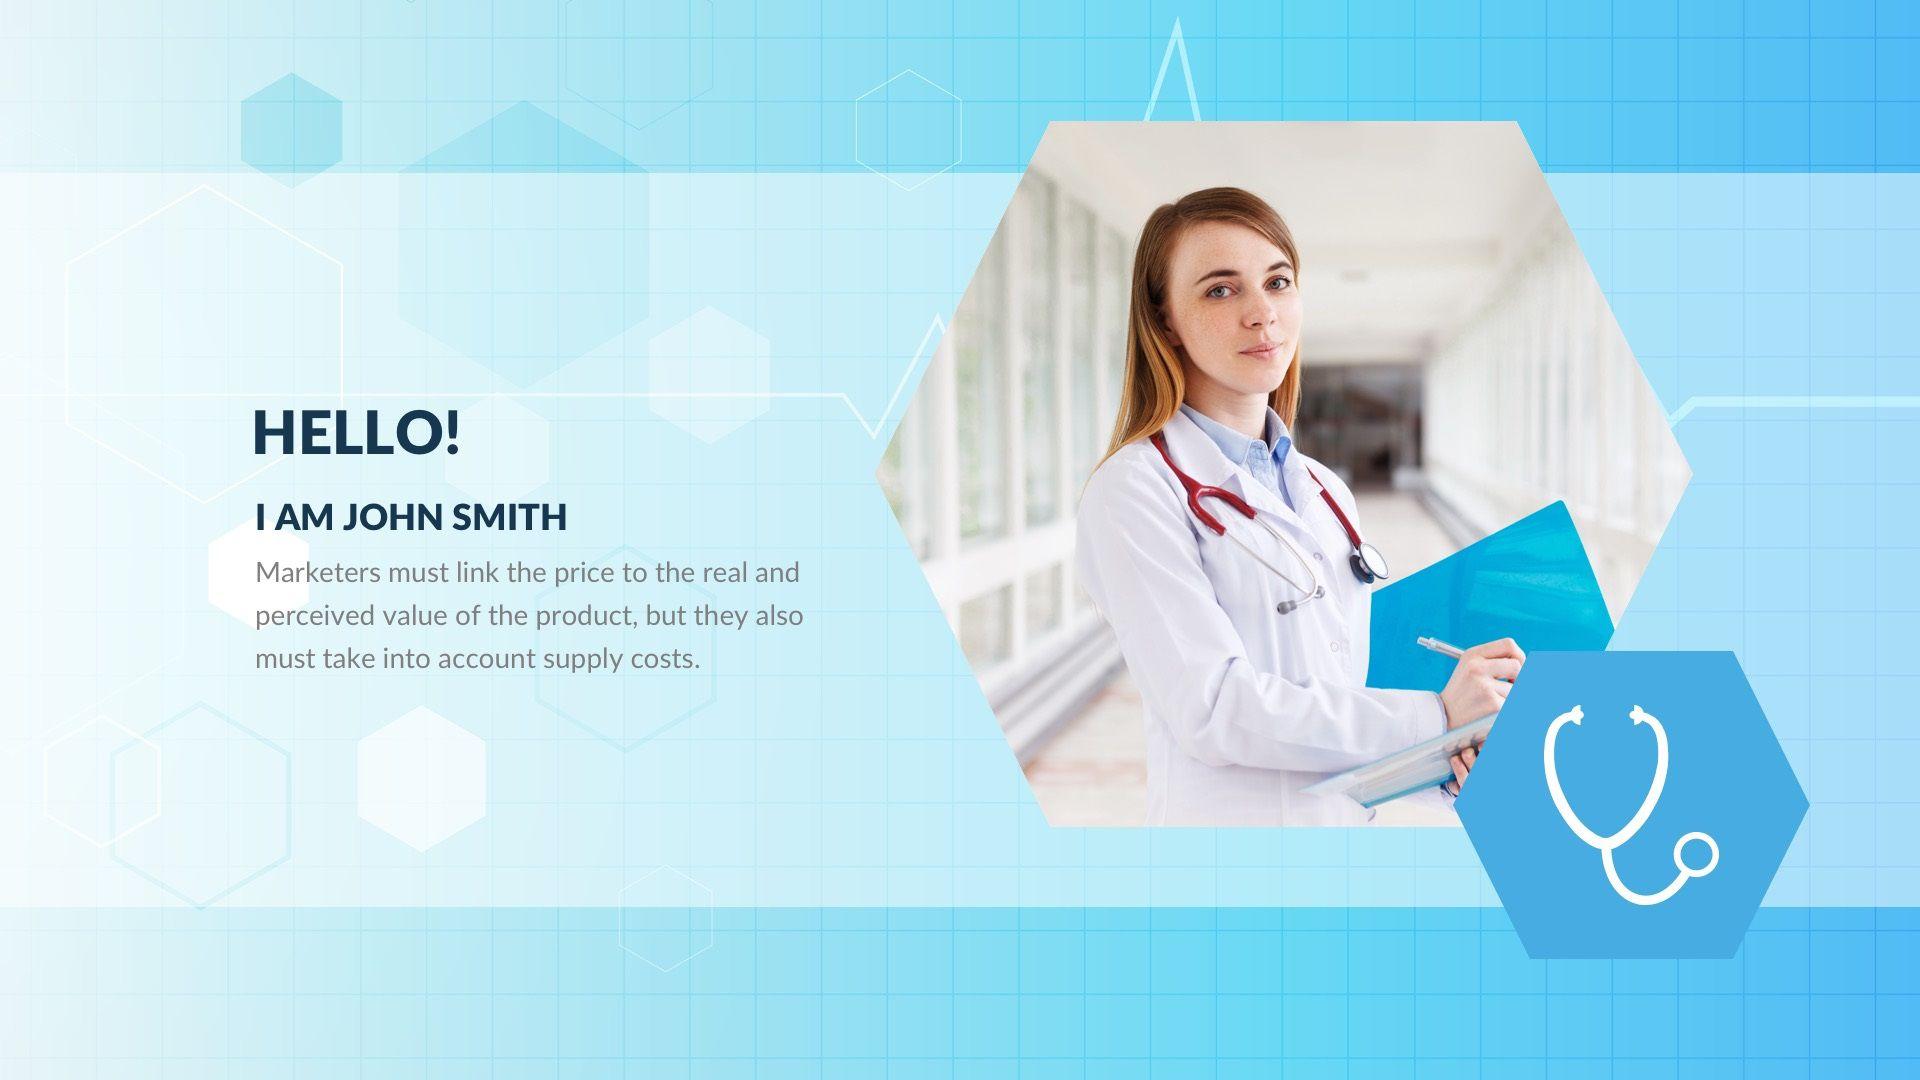 001 Striking Free Nursing Powerpoint Template Highest Clarity  Education DownloadFull